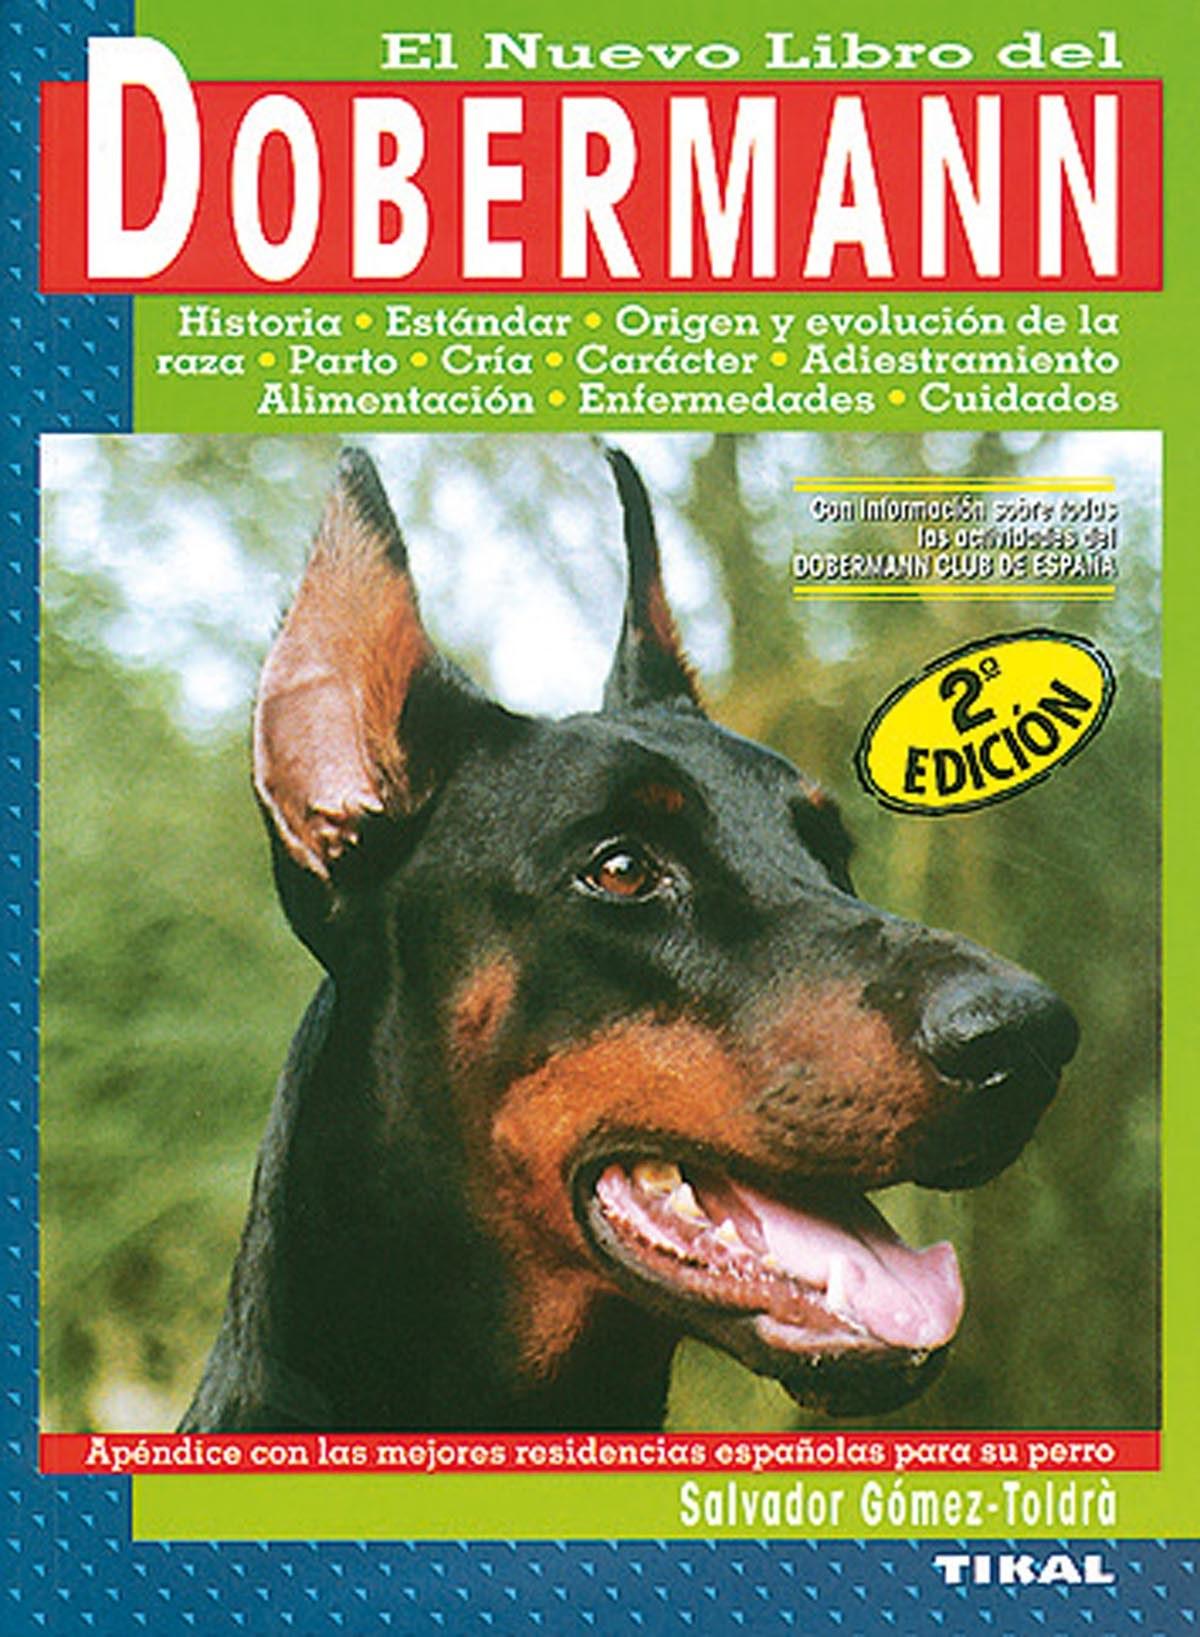 Dobermann 9788430582150